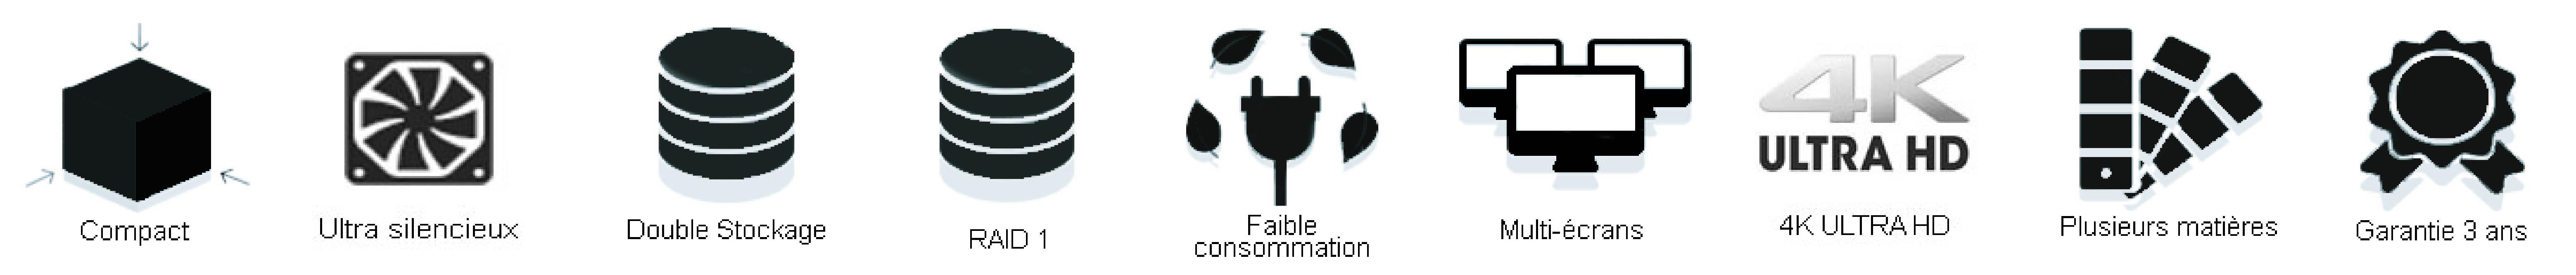 https://www.bleujour.com/wp-content/uploads/2019/11/bandeau-picto-move-fr.jpg